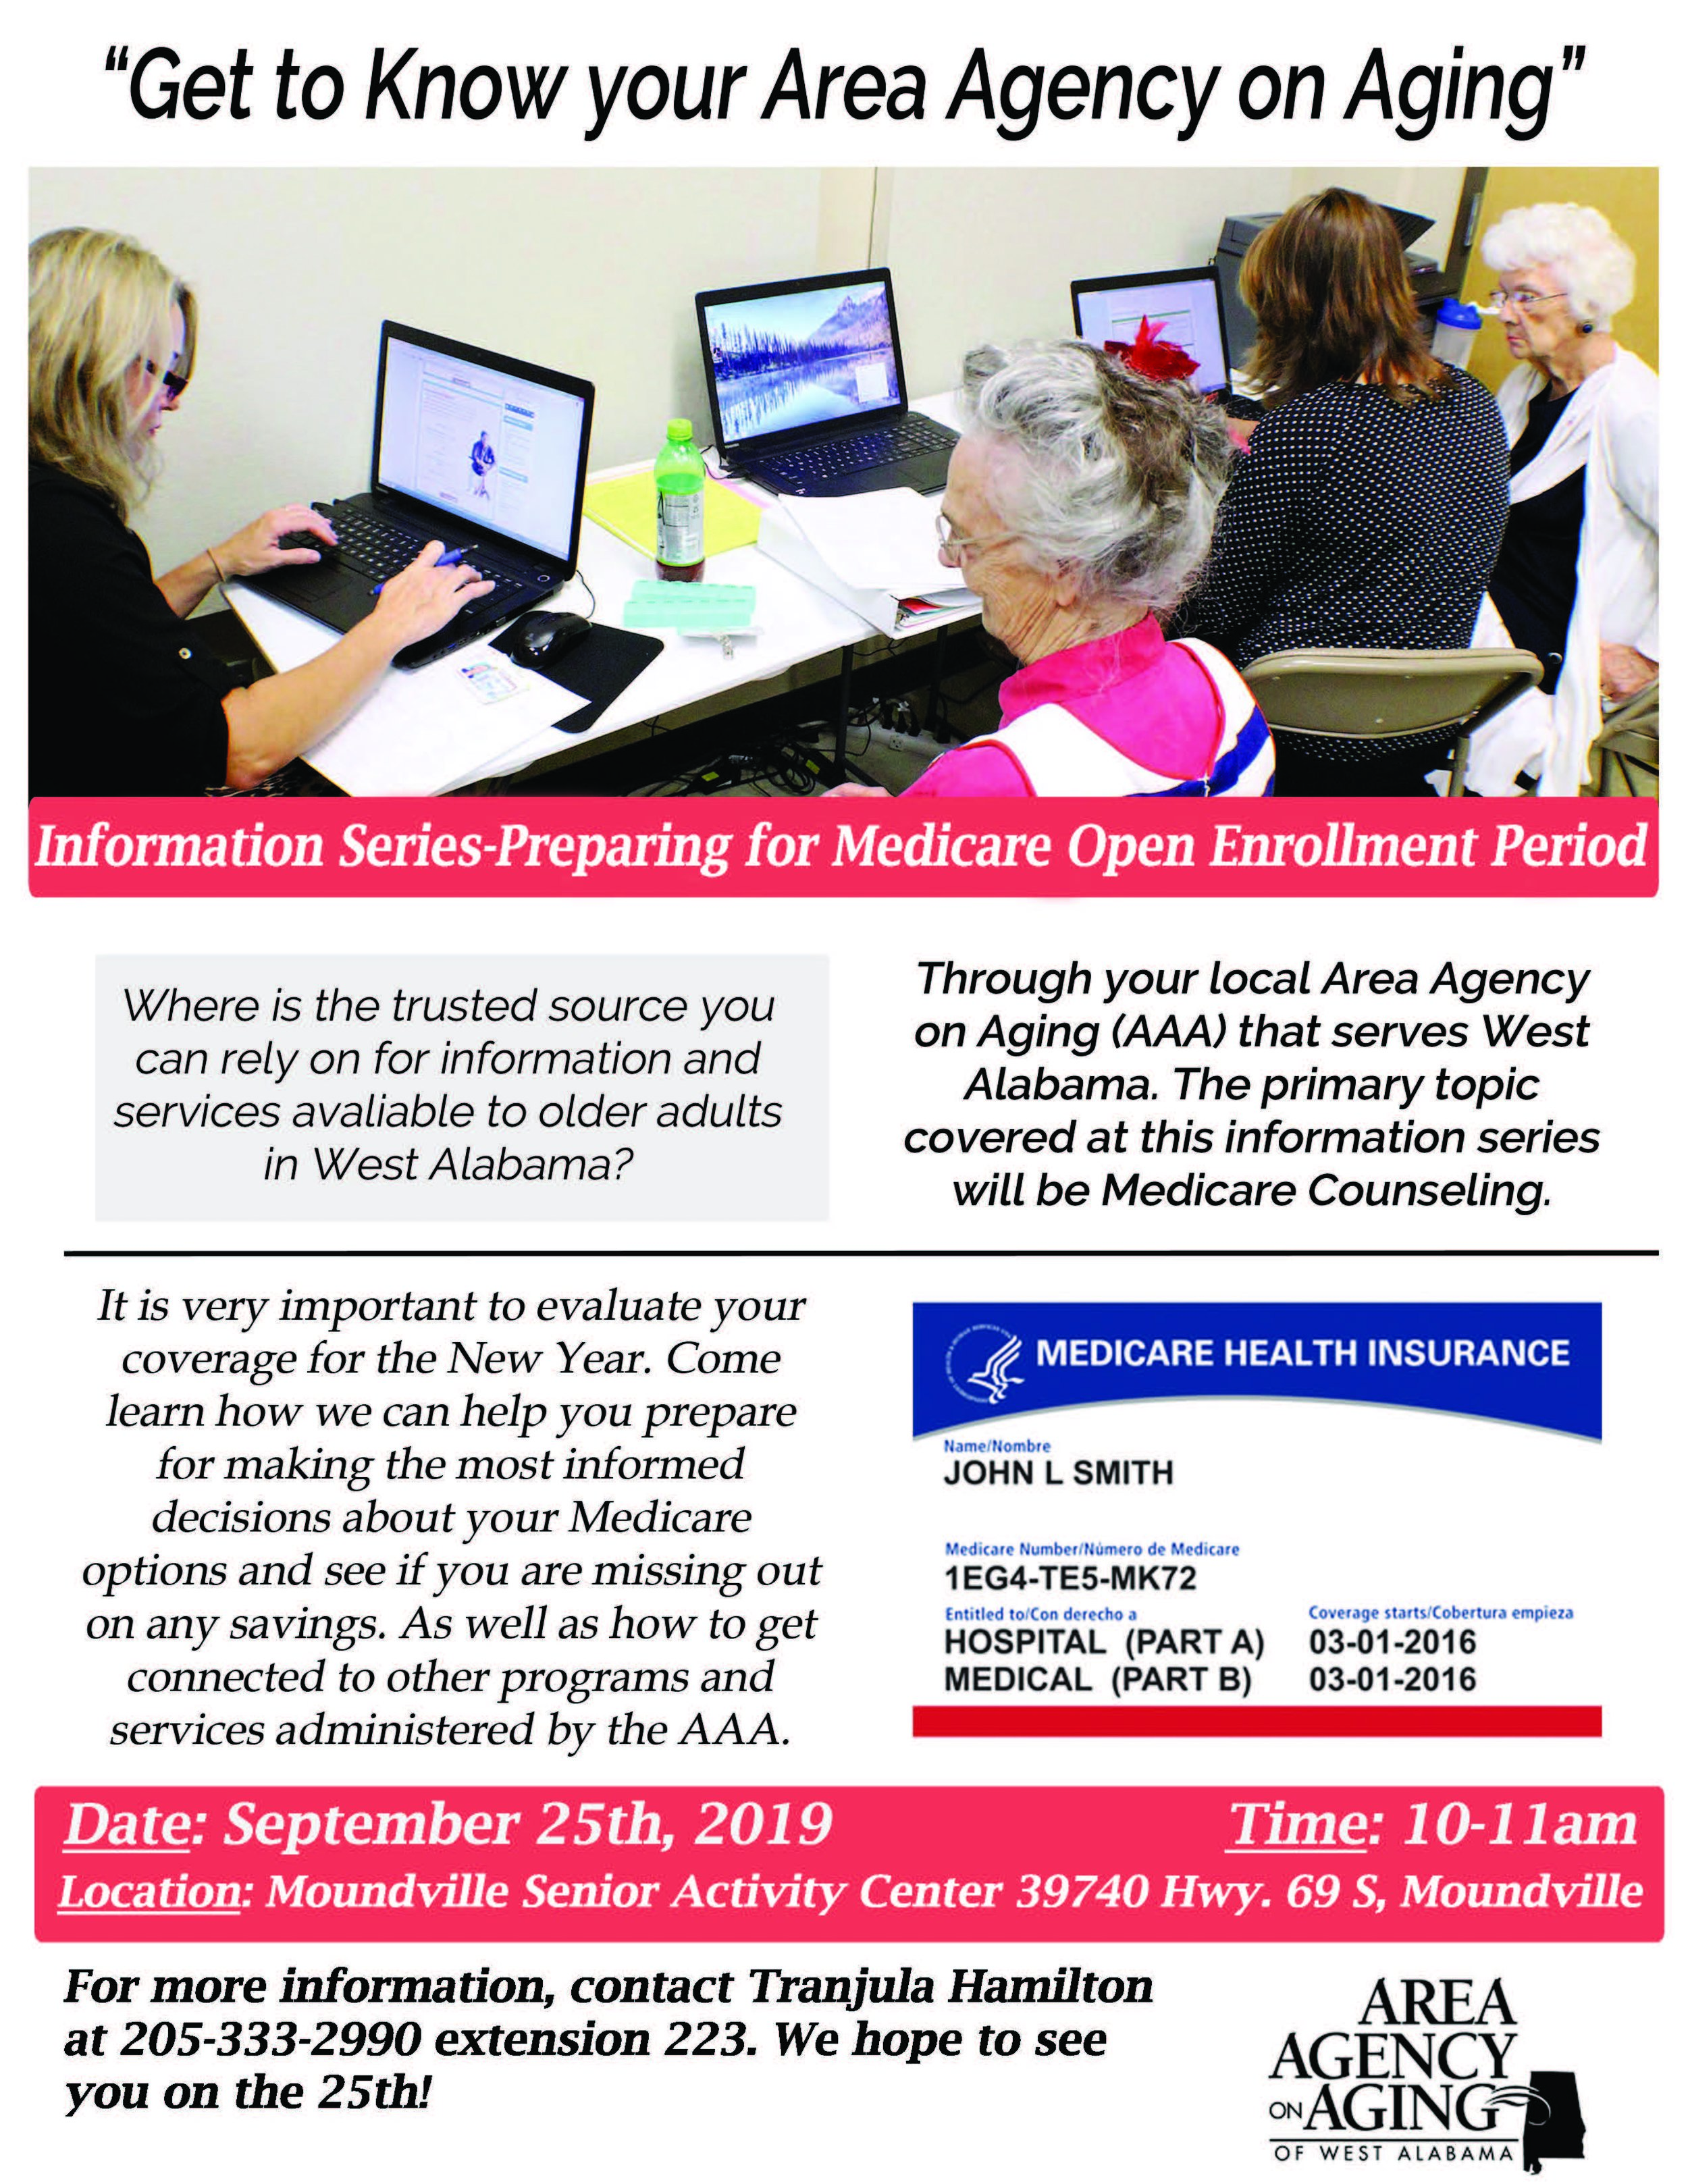 Medicare Counseling Flyer 2019 - Moundville.jpg